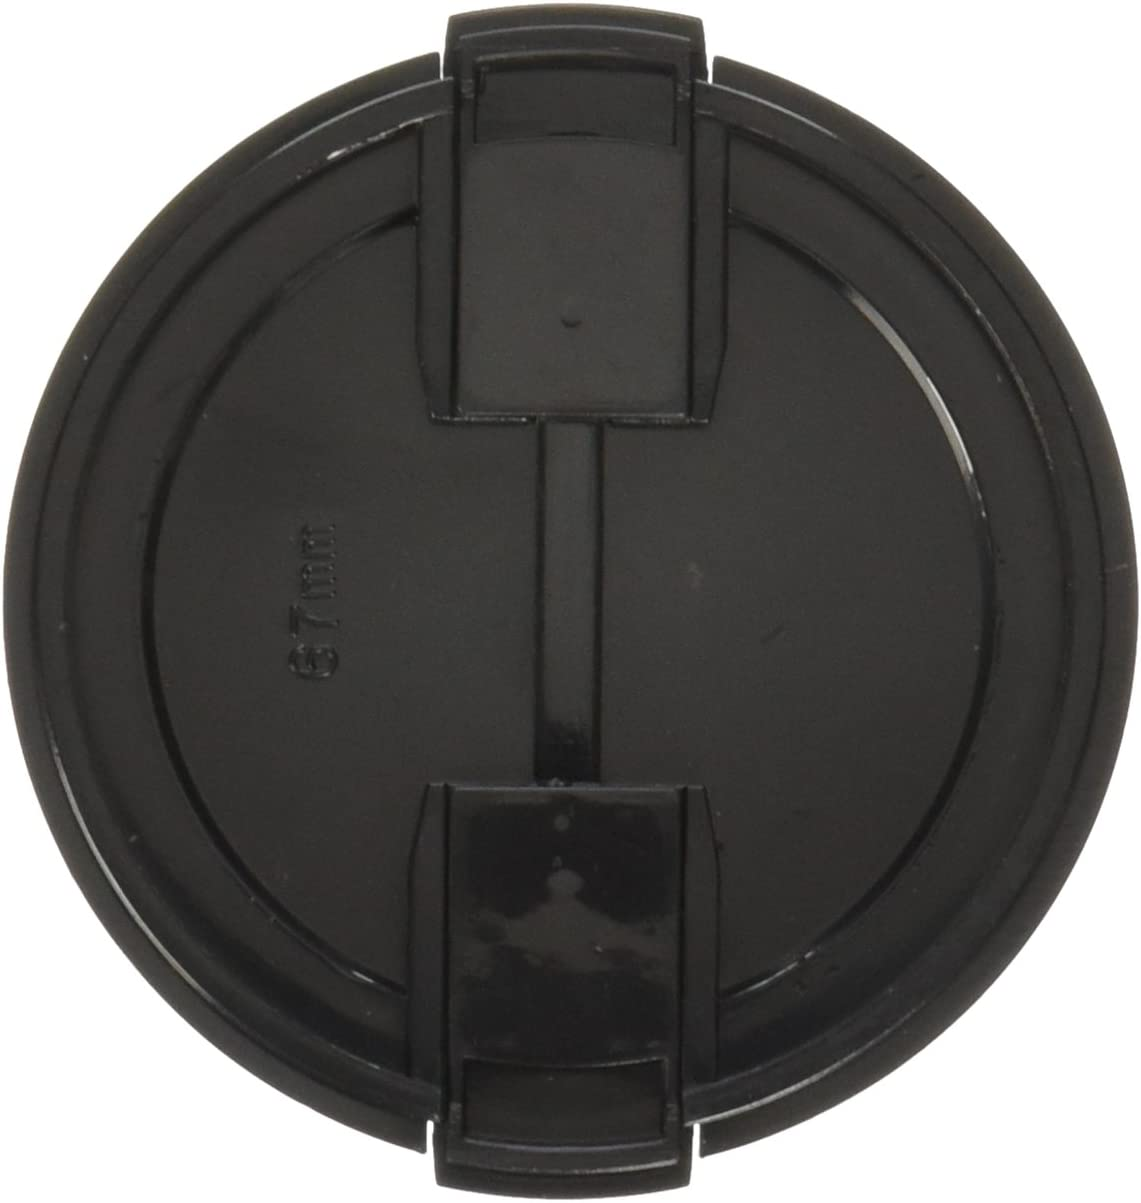 Bower 67mm Plastic Lens Cap